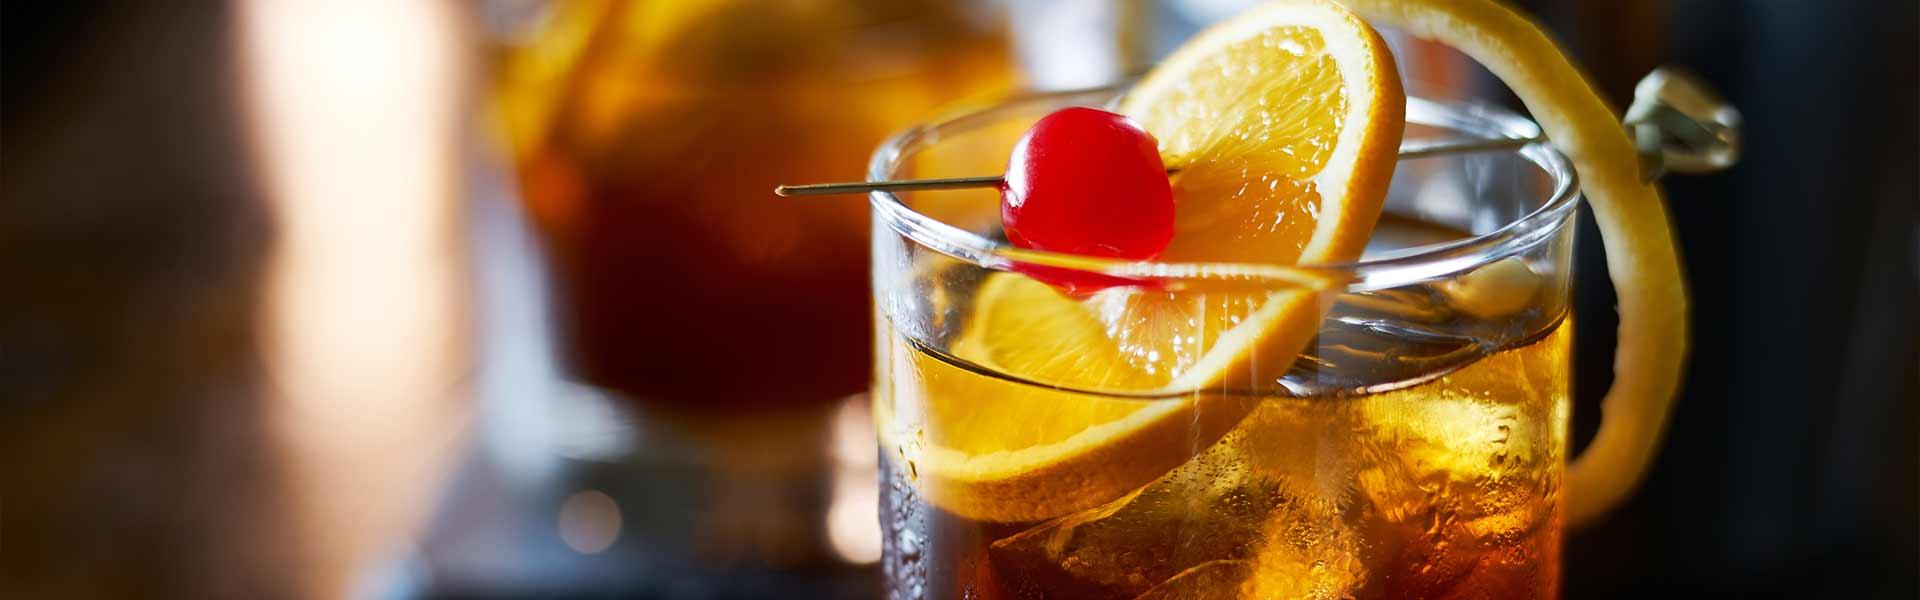 signature-drinks-large